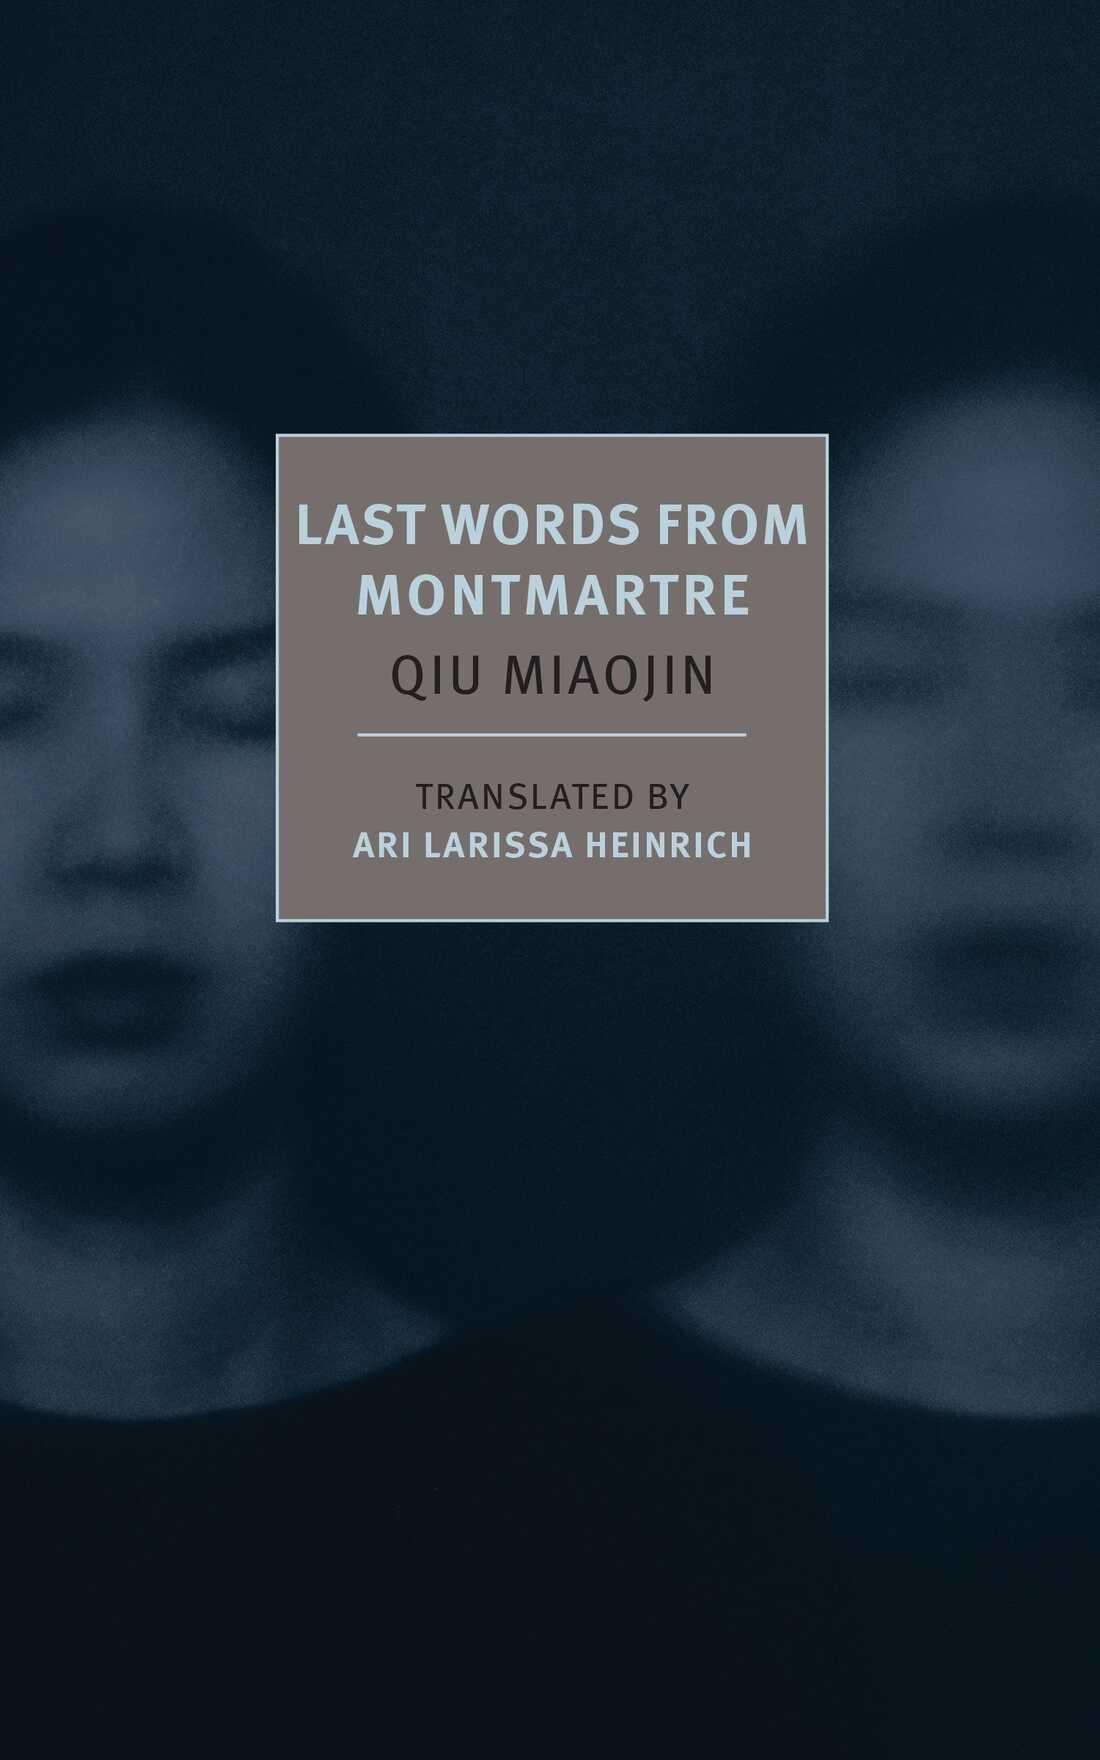 Last Words from Montmartre, by Qiu Miaojin, translated by Ari Larissa Heinrich